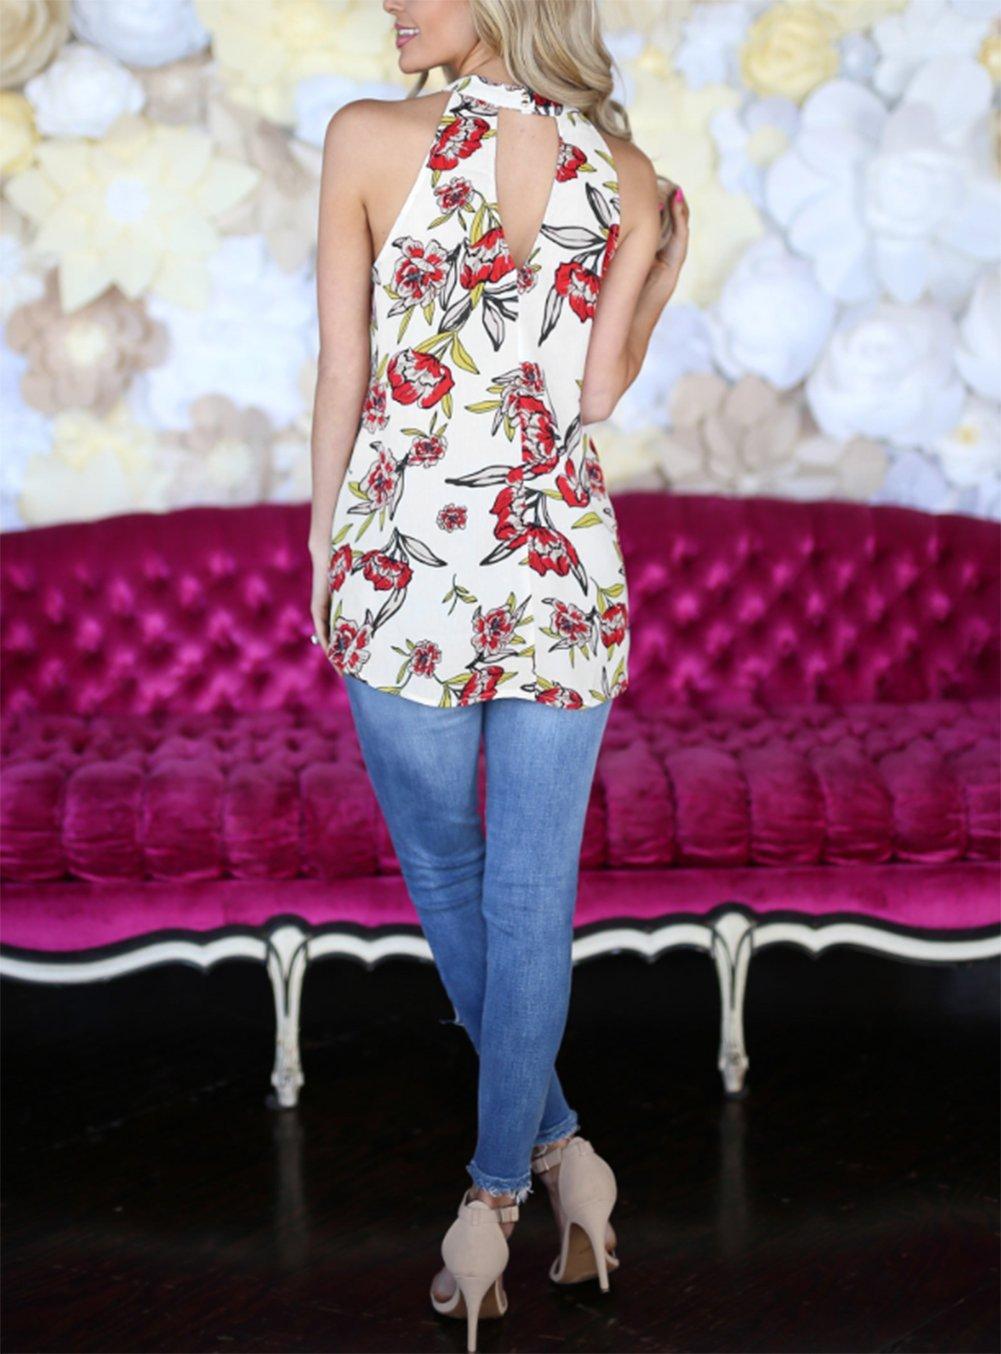 Comcrib Womens Casual Floral Printed Sleeveless Vest Shirt, Ladies Tank Top Blouse Tunic Tops Summer Beachwear T-Shirt by Comcrib (Image #7)